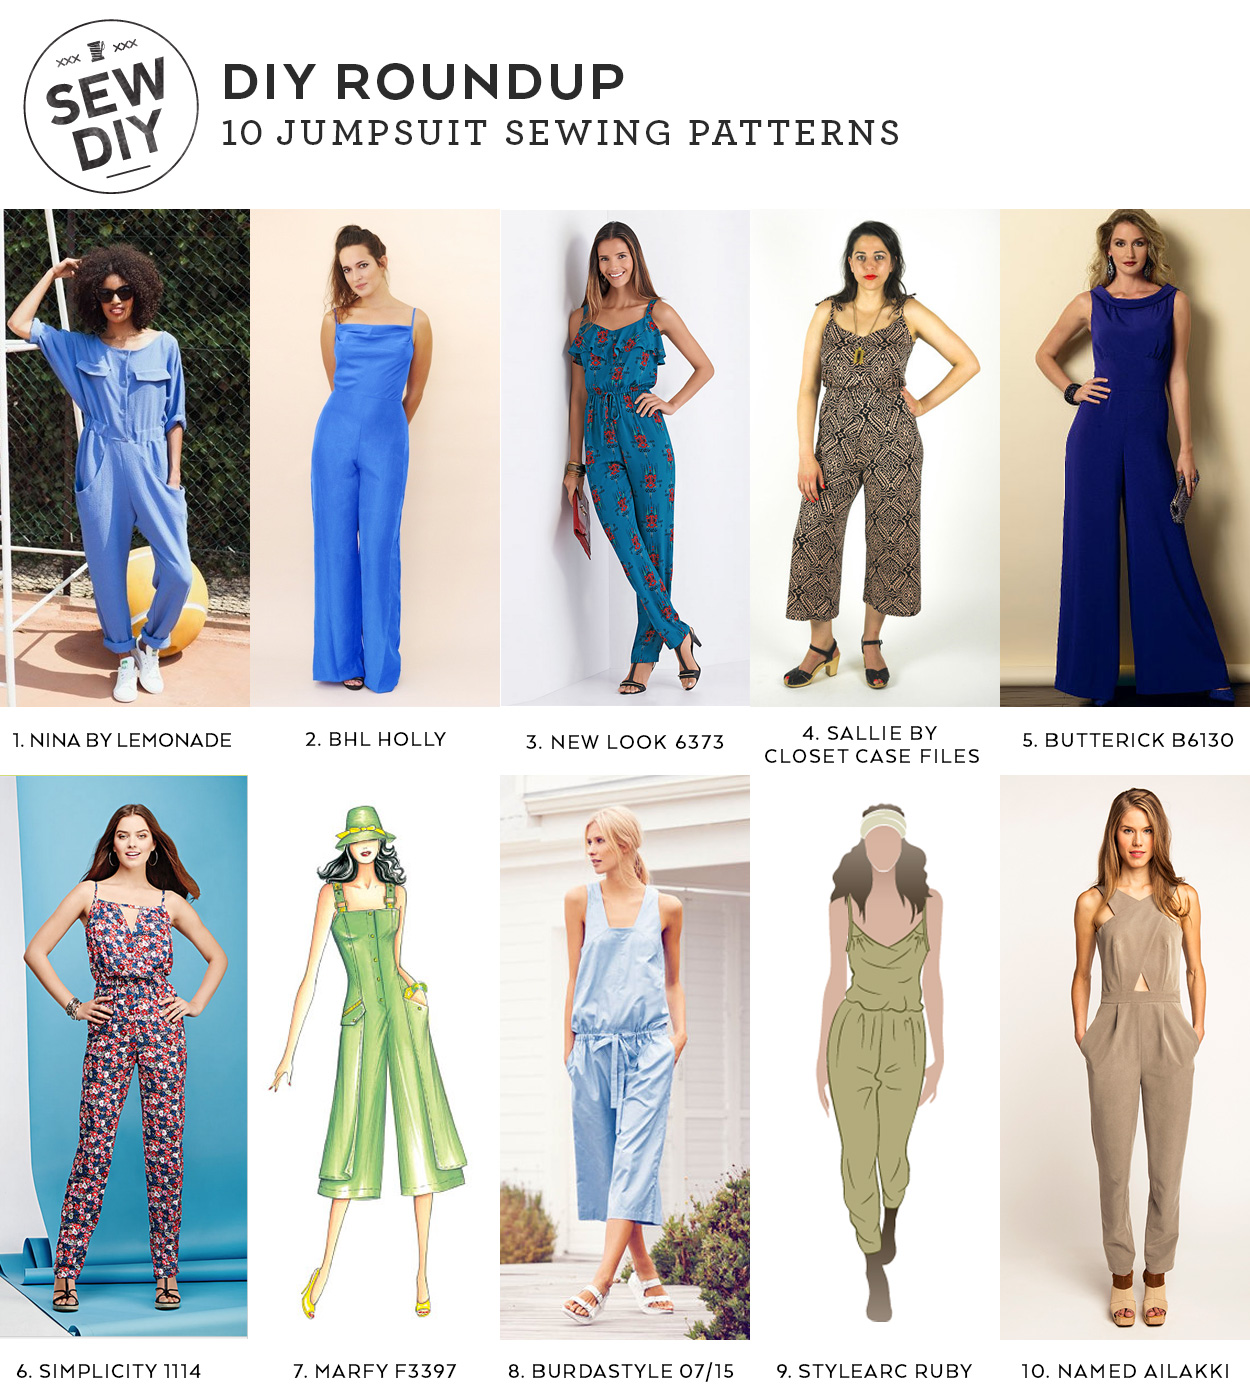 fbeef03f350 DIY Roundup – 10 Jumpsuit Sewing Patterns — Sew DIY